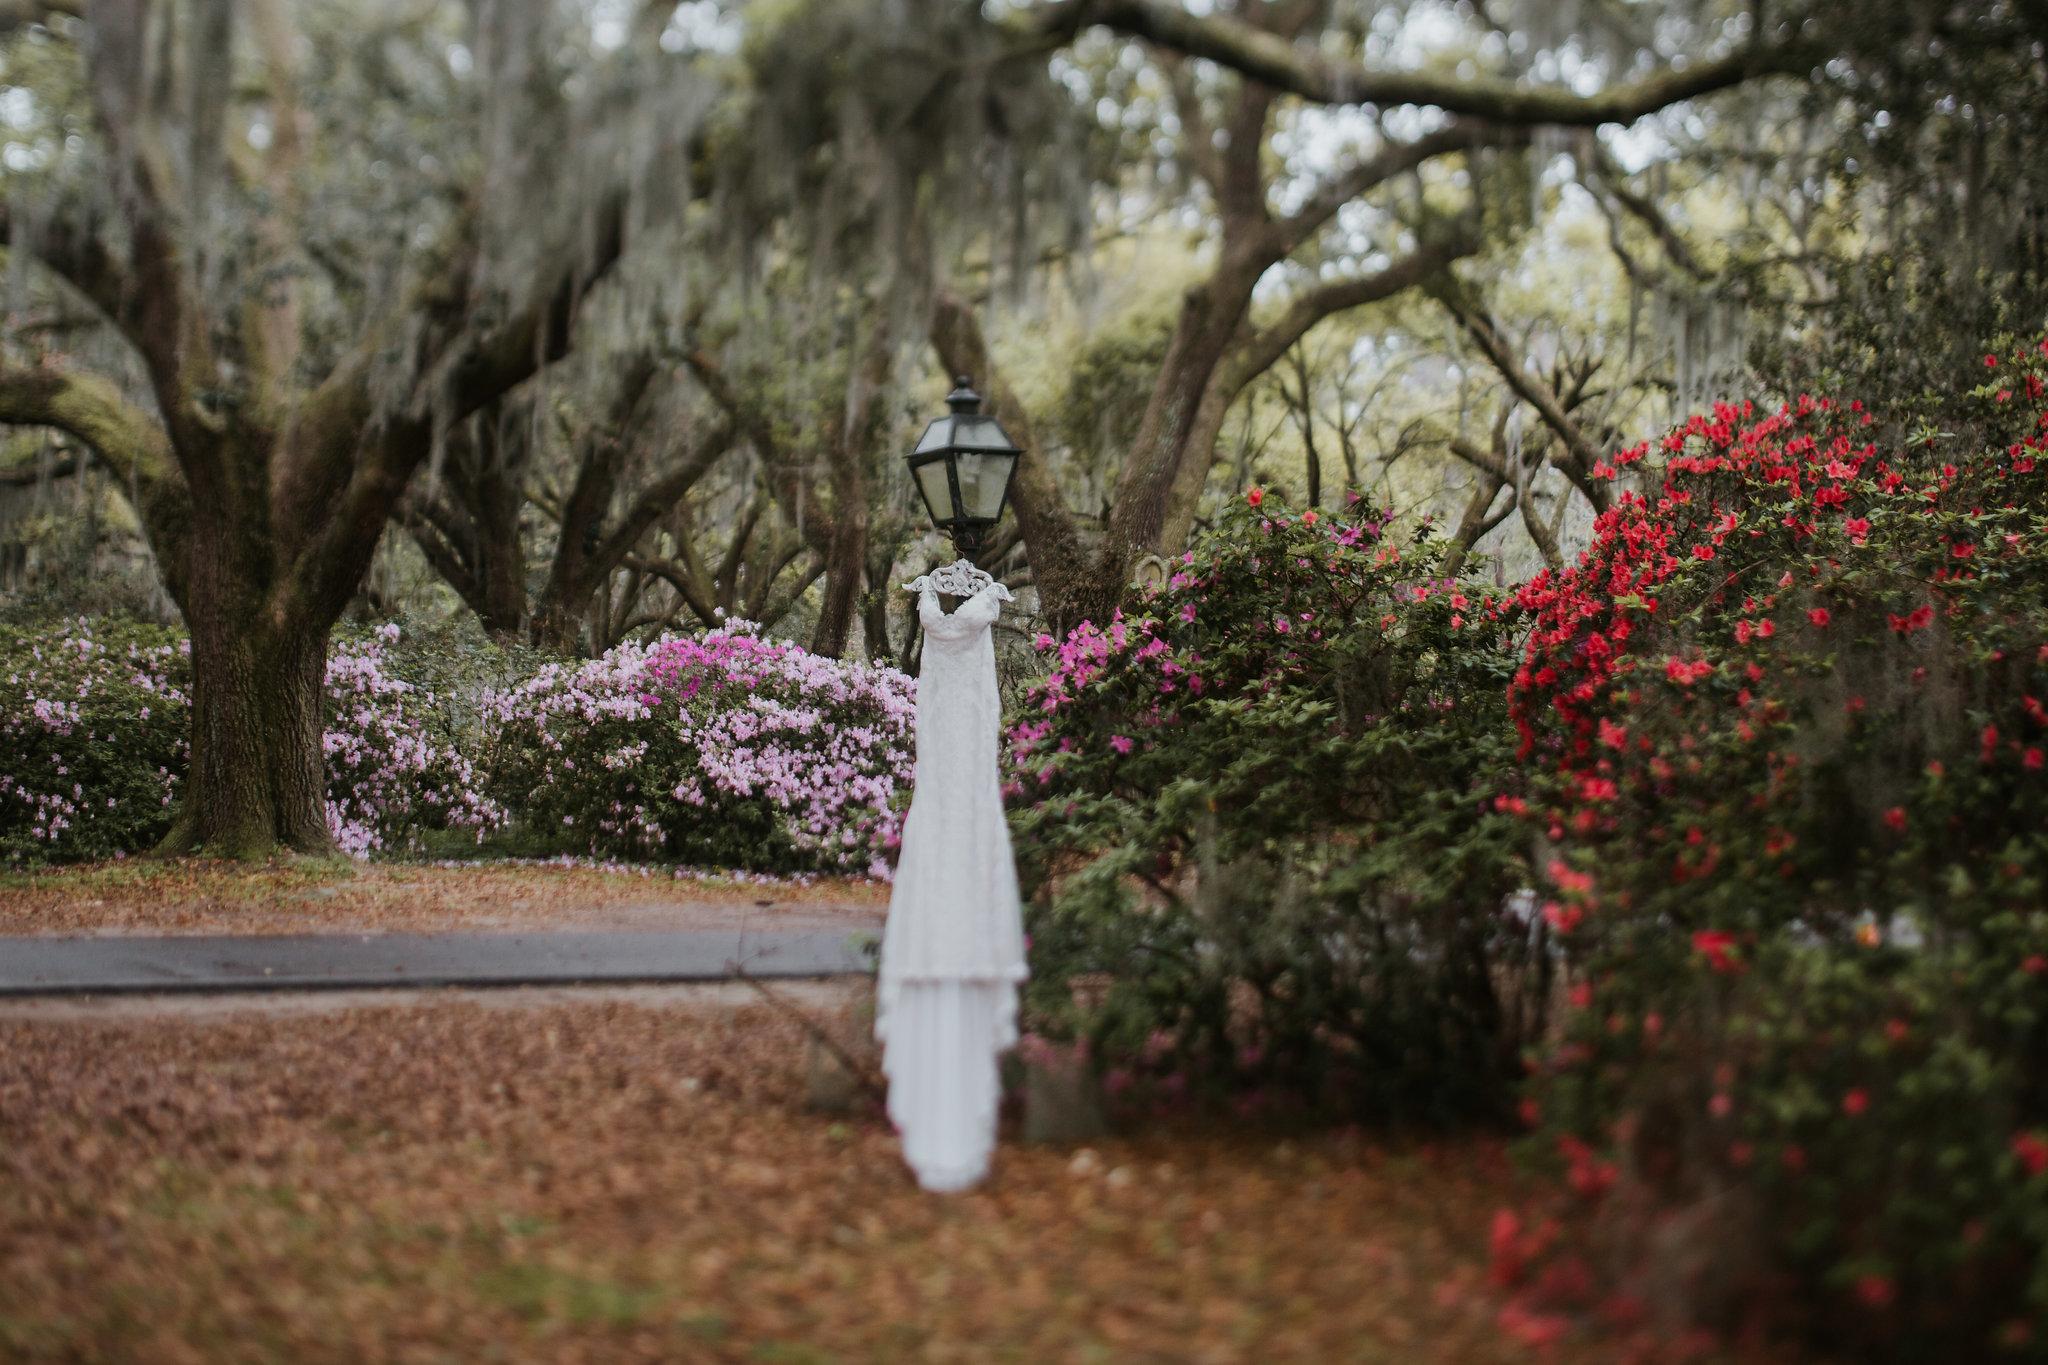 Legare-Waring-House-Charleston-SC-wedding-portrait-photography-22.jpg